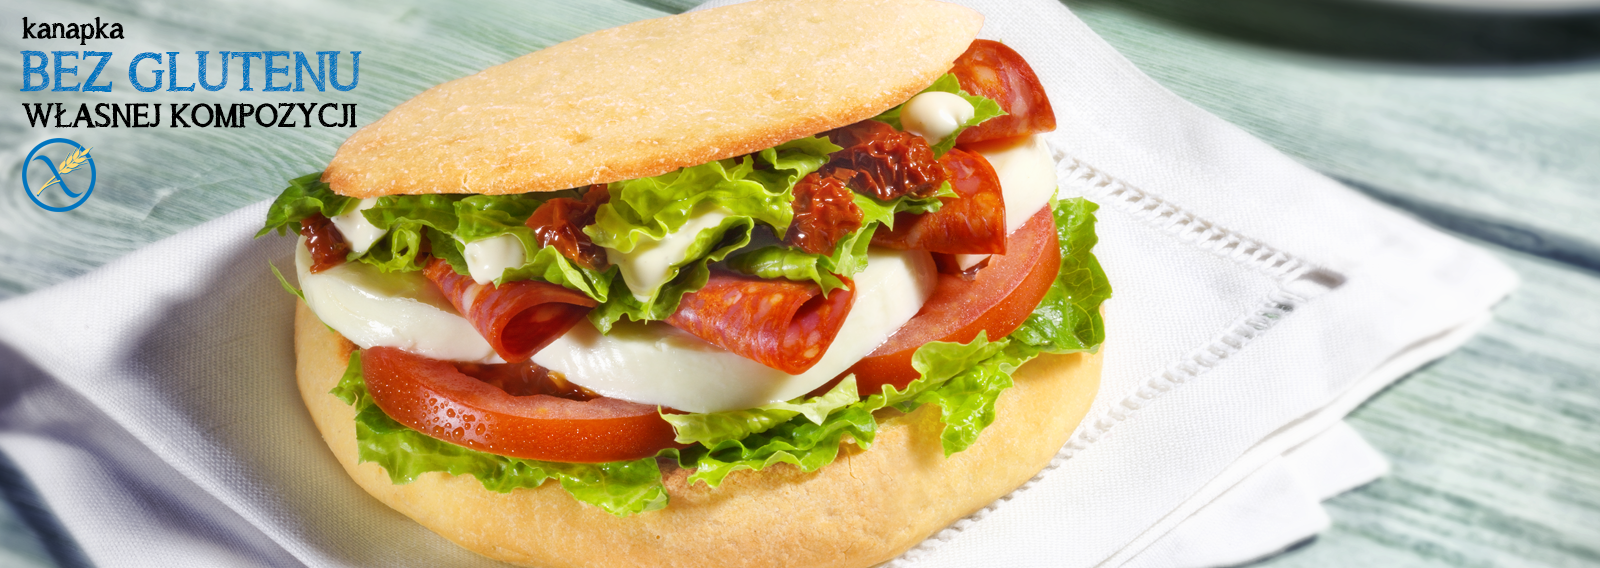 kanapka bez glutenu